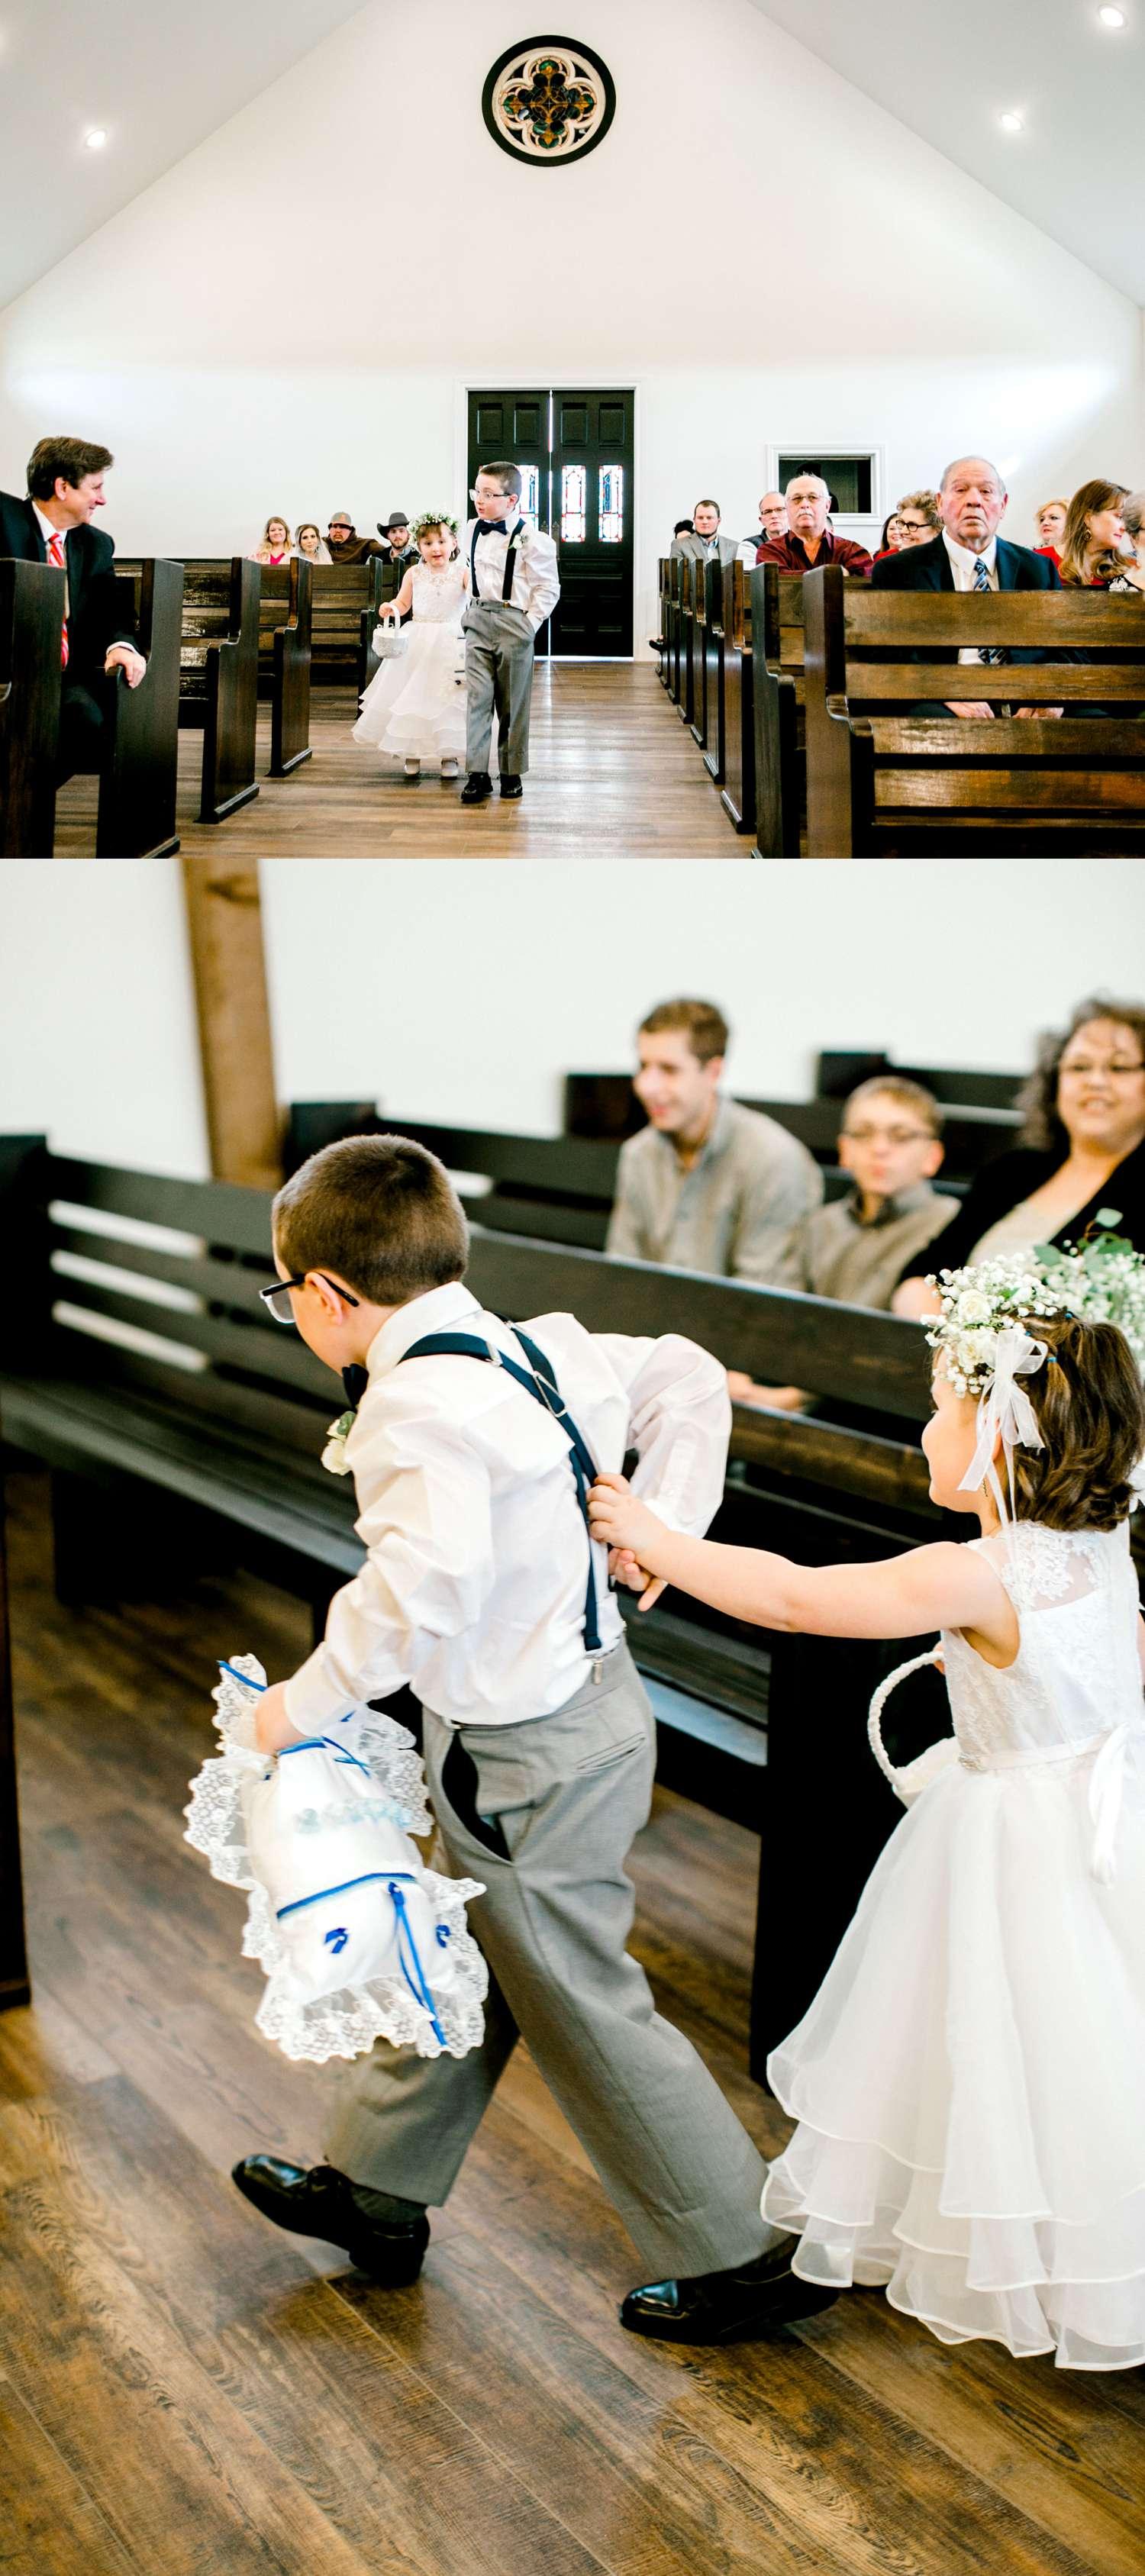 CASSIDY+AND+HARLEY+BRADLEY+EBERLEY+BROOKS+CHAPEL+LUBBOCK+WEDDING+PHOTOGRAPHER+ALLEEJ_0063.jpg